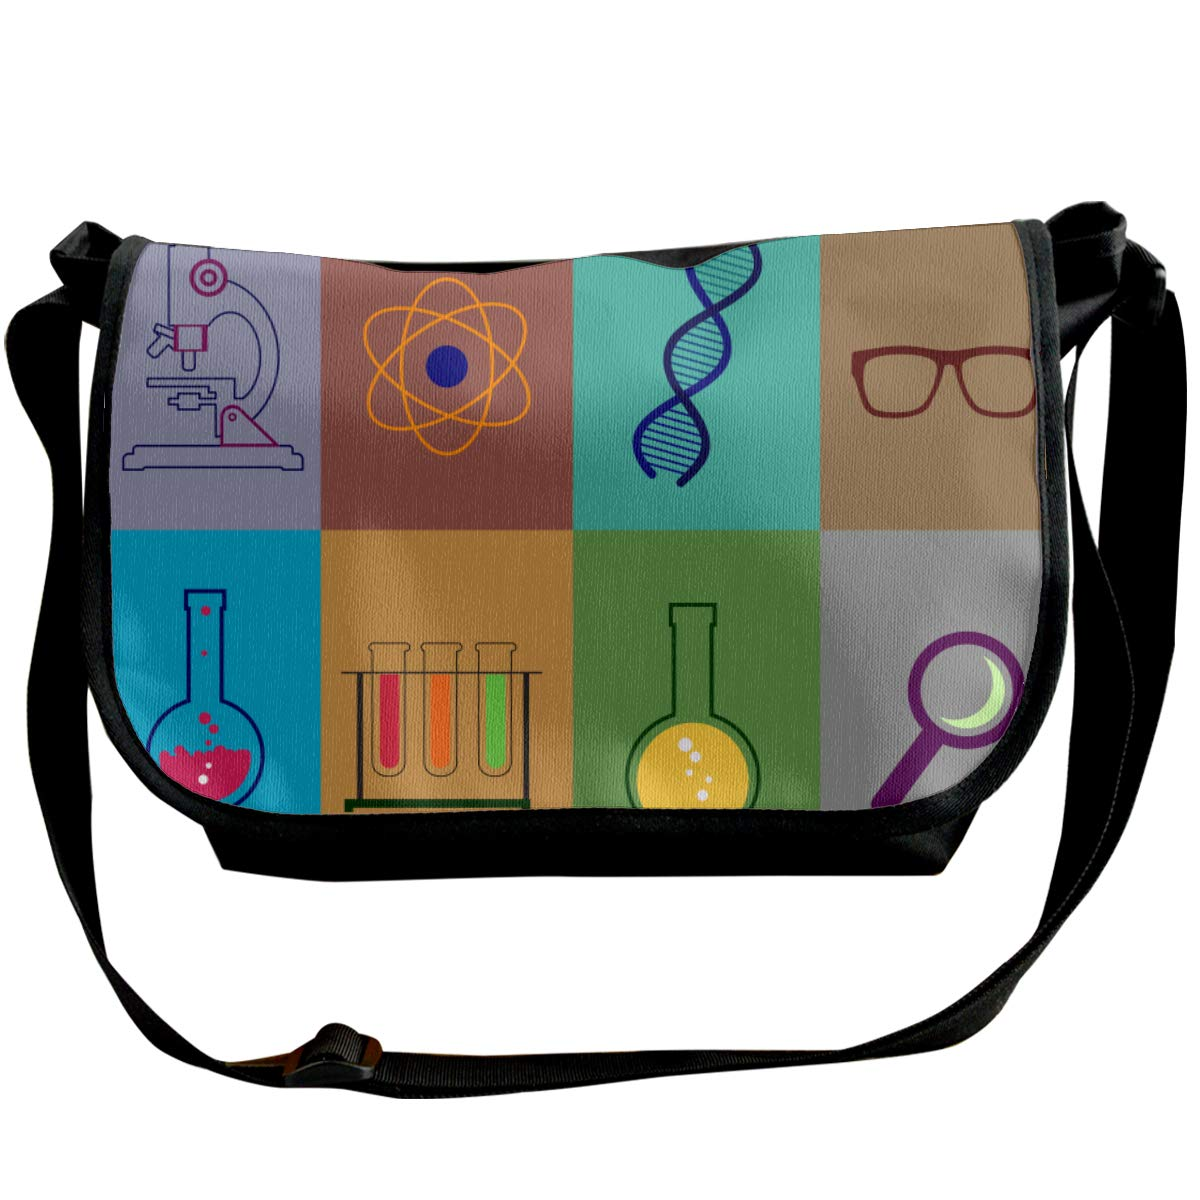 Futong Huaxia Physical Chemistry Science Travel Messenger Bags Handbag Shoulder Bag Crossbody Bag Unisex